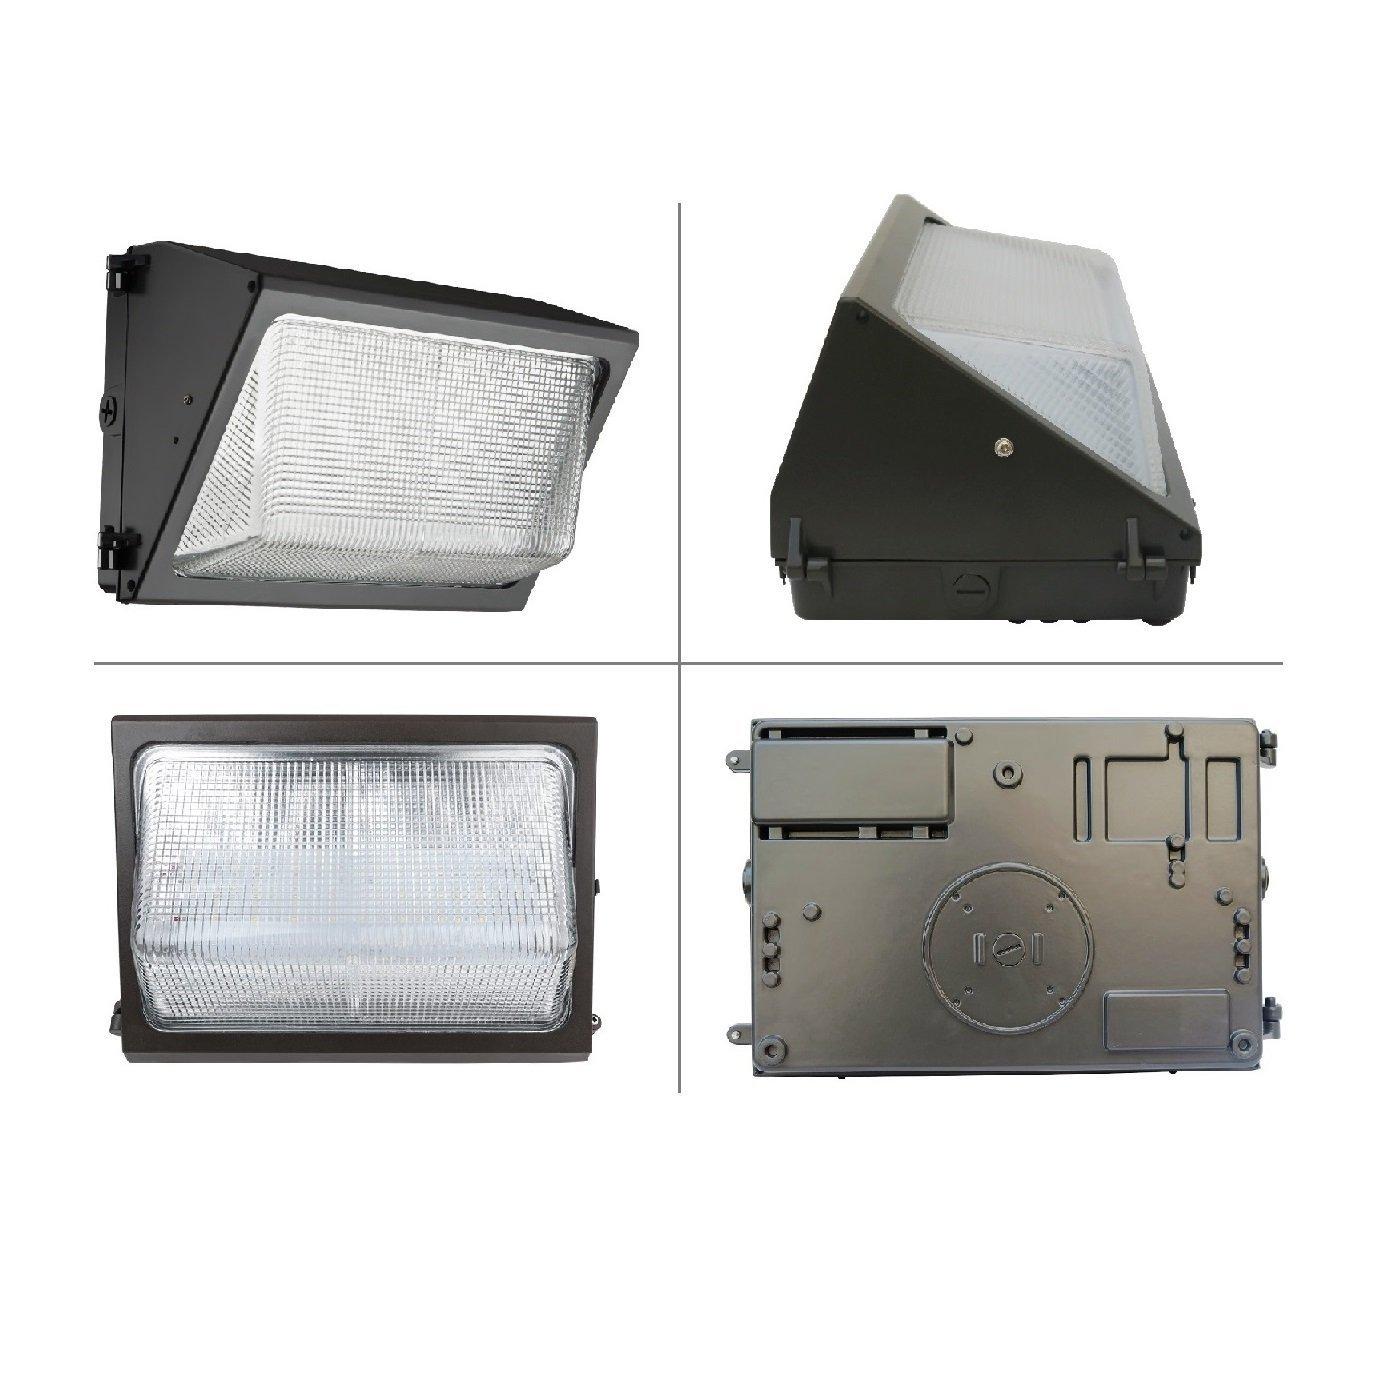 Daylight White 5000K 600W HPS//HID Replacement UL Approved 100 Lumen per Watt HERO-LED  WAL-100W-DW LED 100W Wall Pack Light